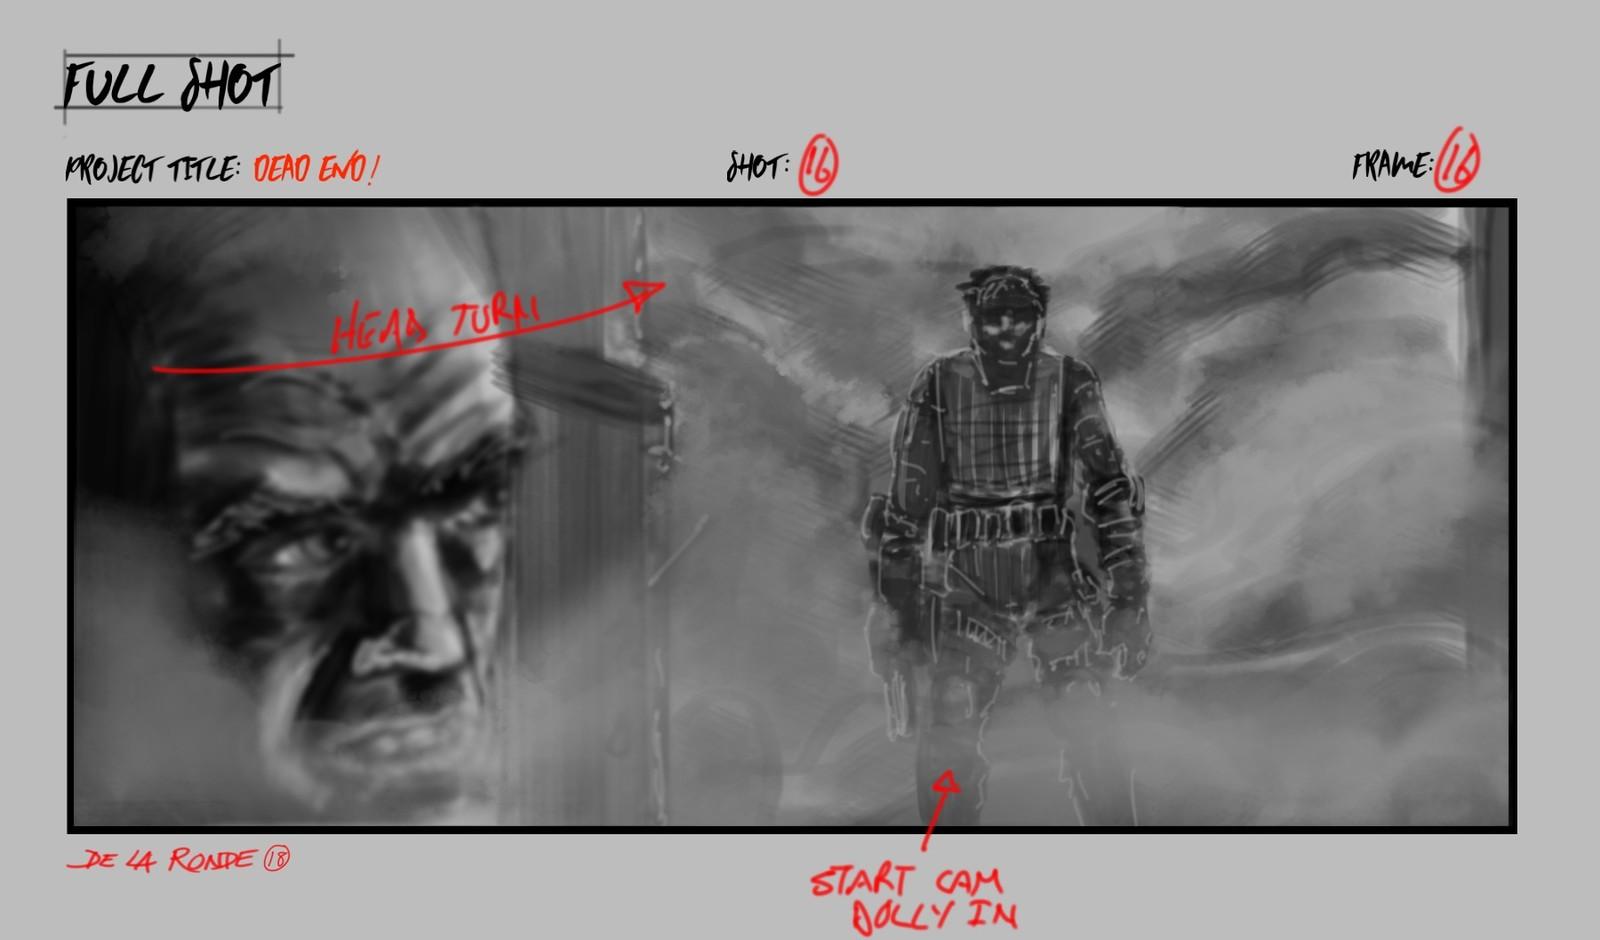 Board Sample Shot Type: Full Shot